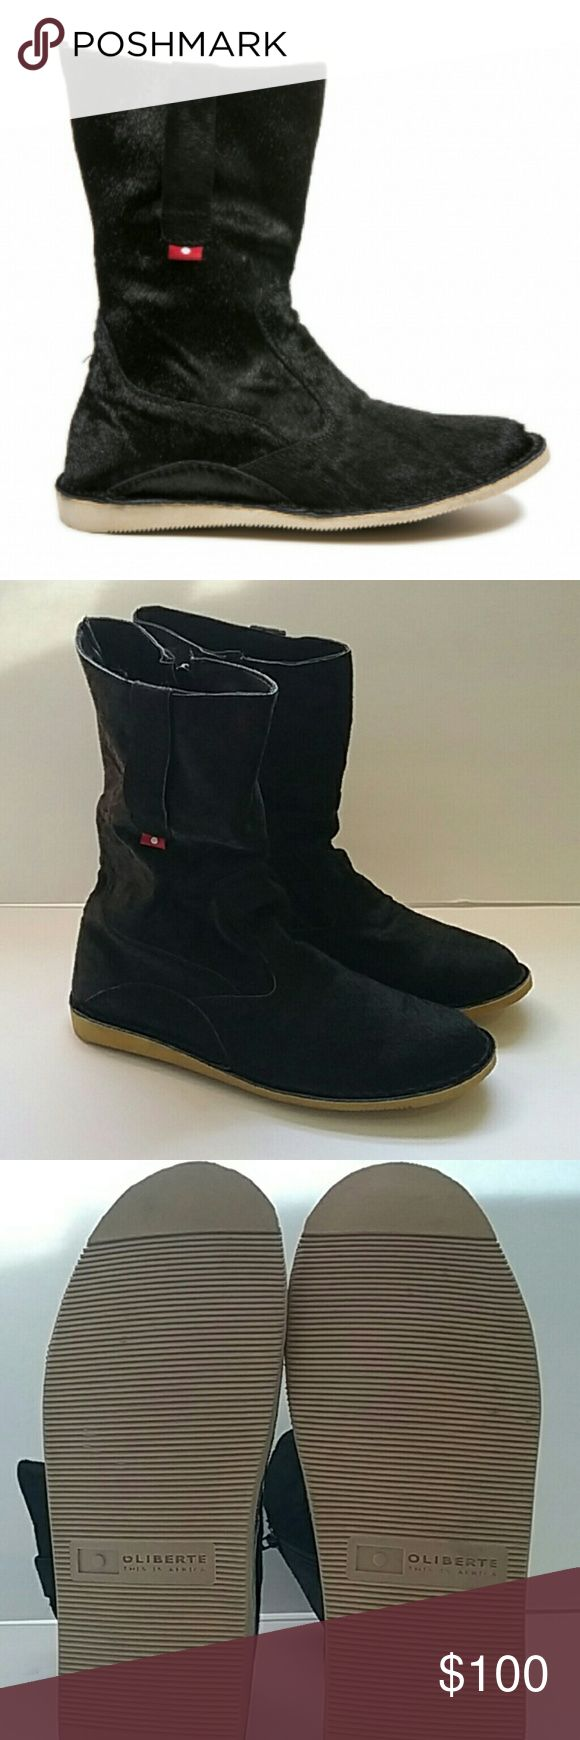 Oliberte Yabela women's boot NWOT Oliberte Yabela women's boots Sleek bl…